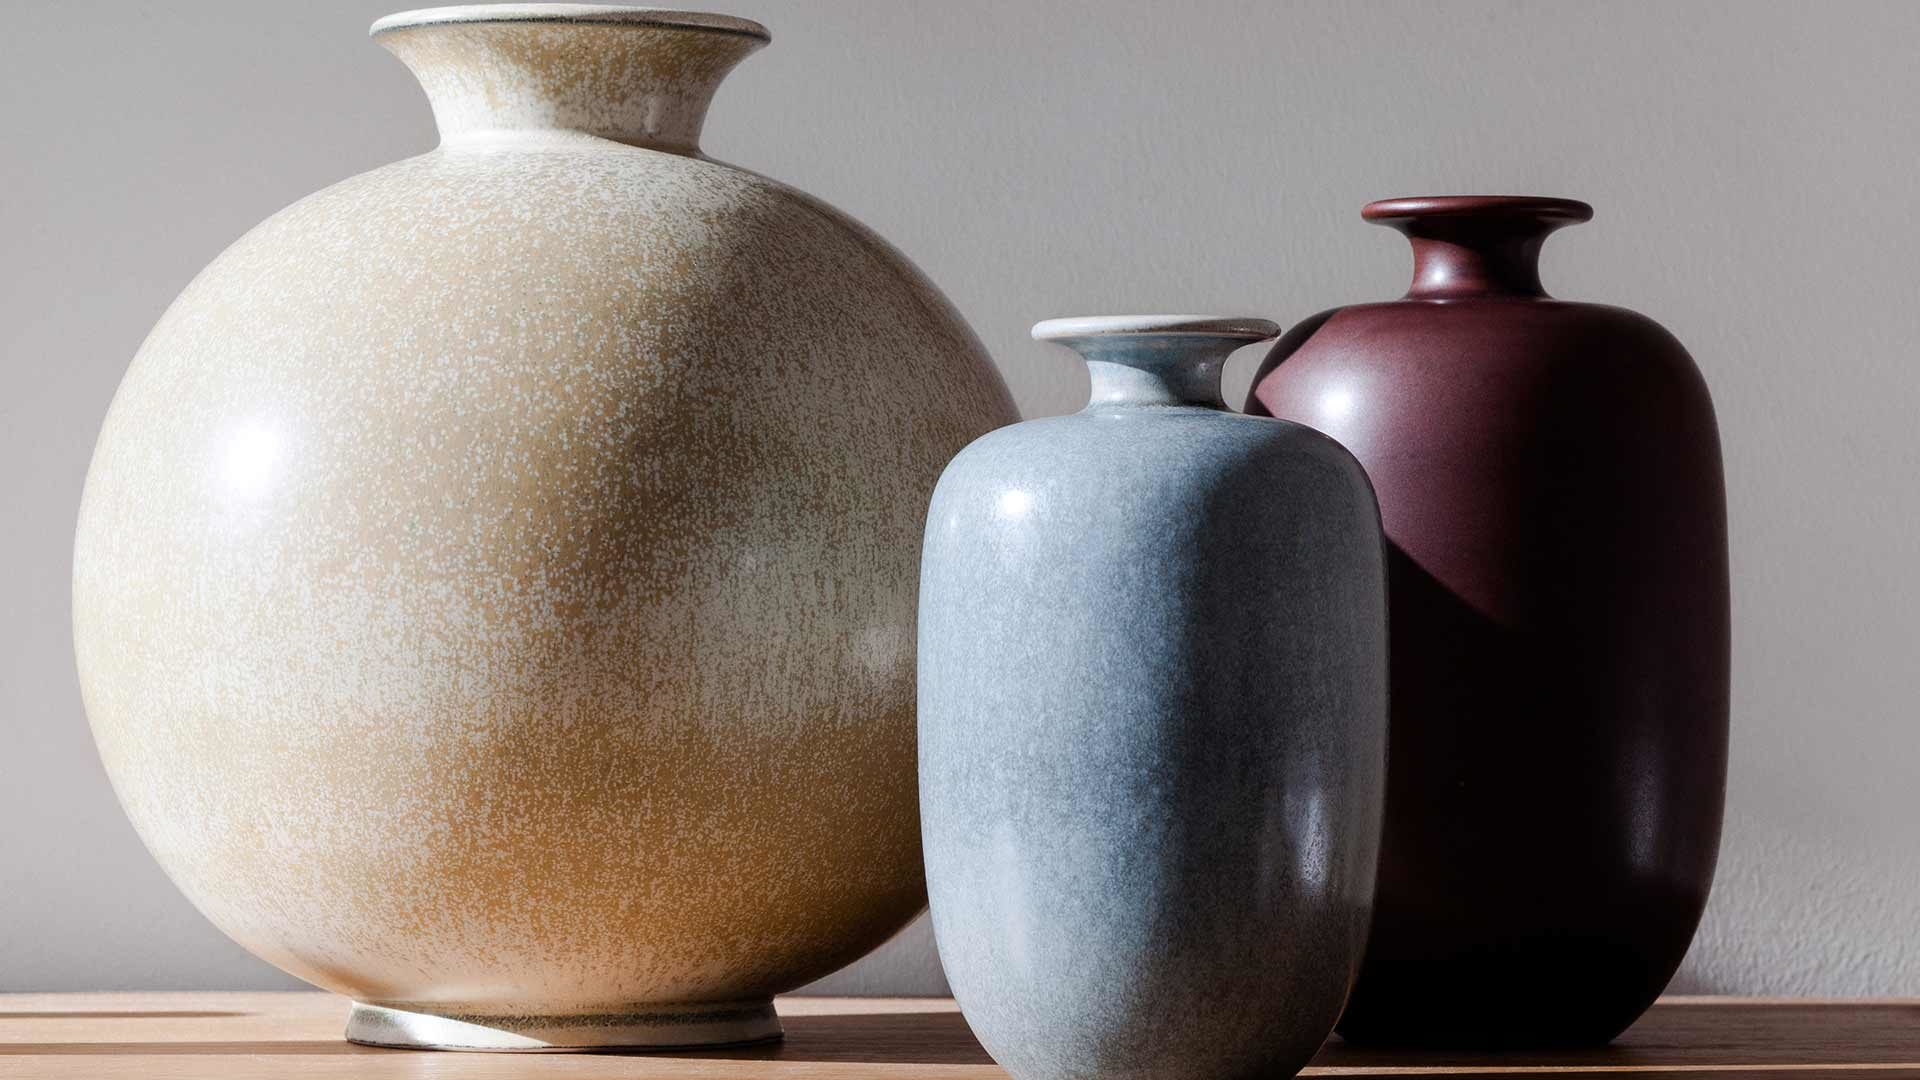 Internationaler Keramikmarkt